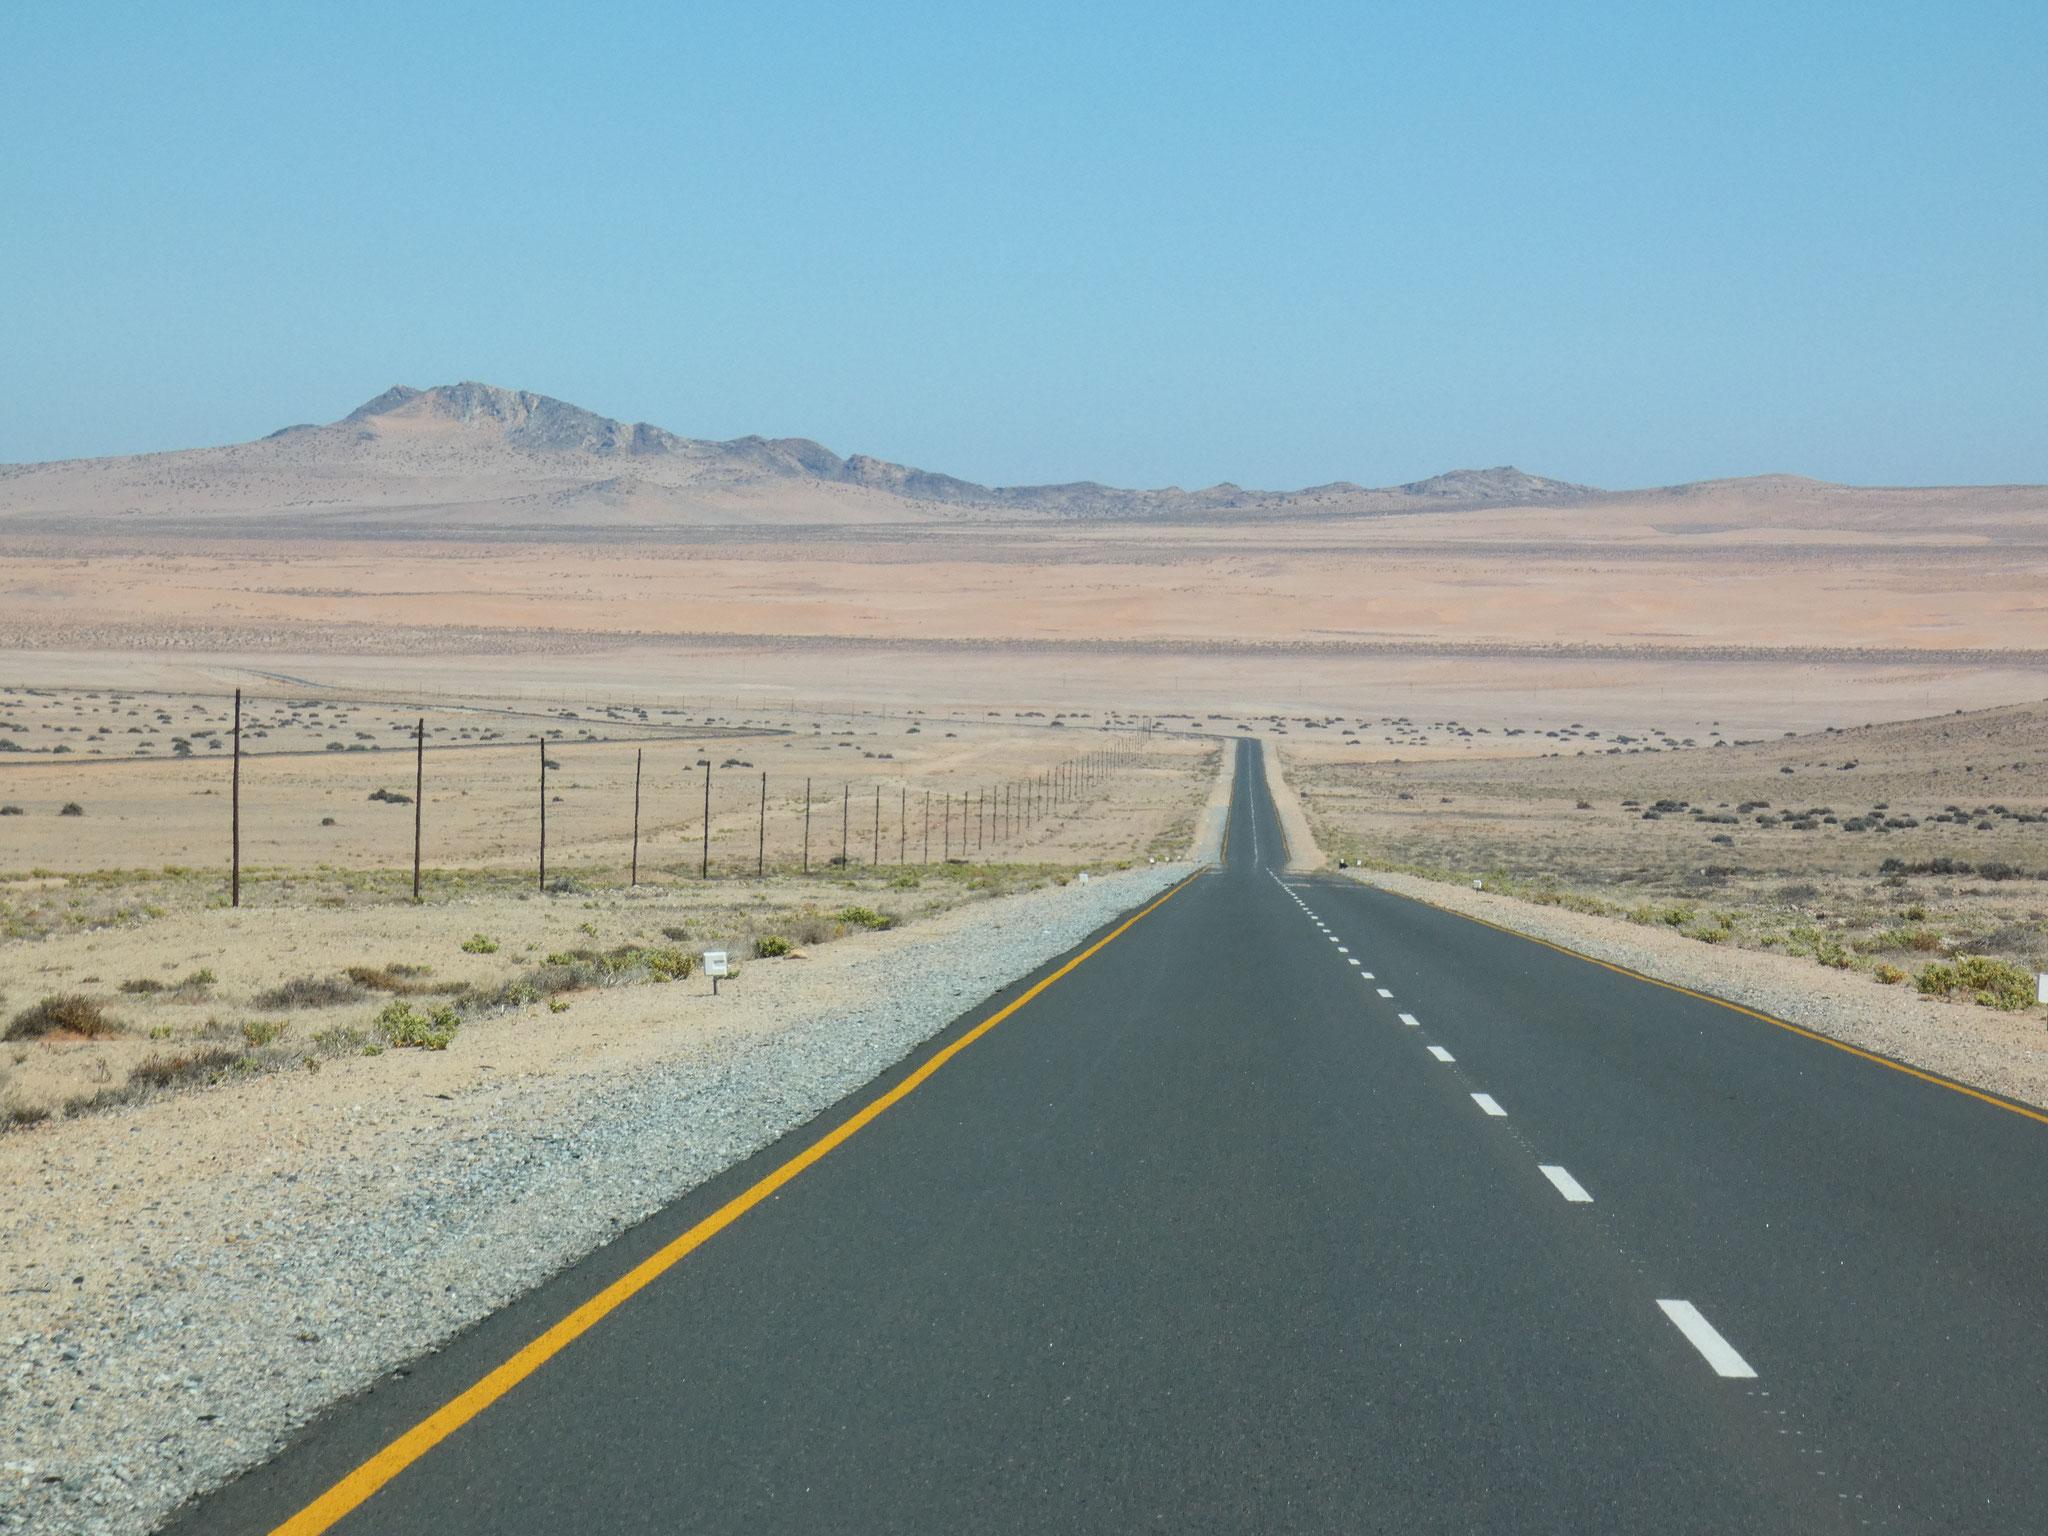 Richtung Lüderitz